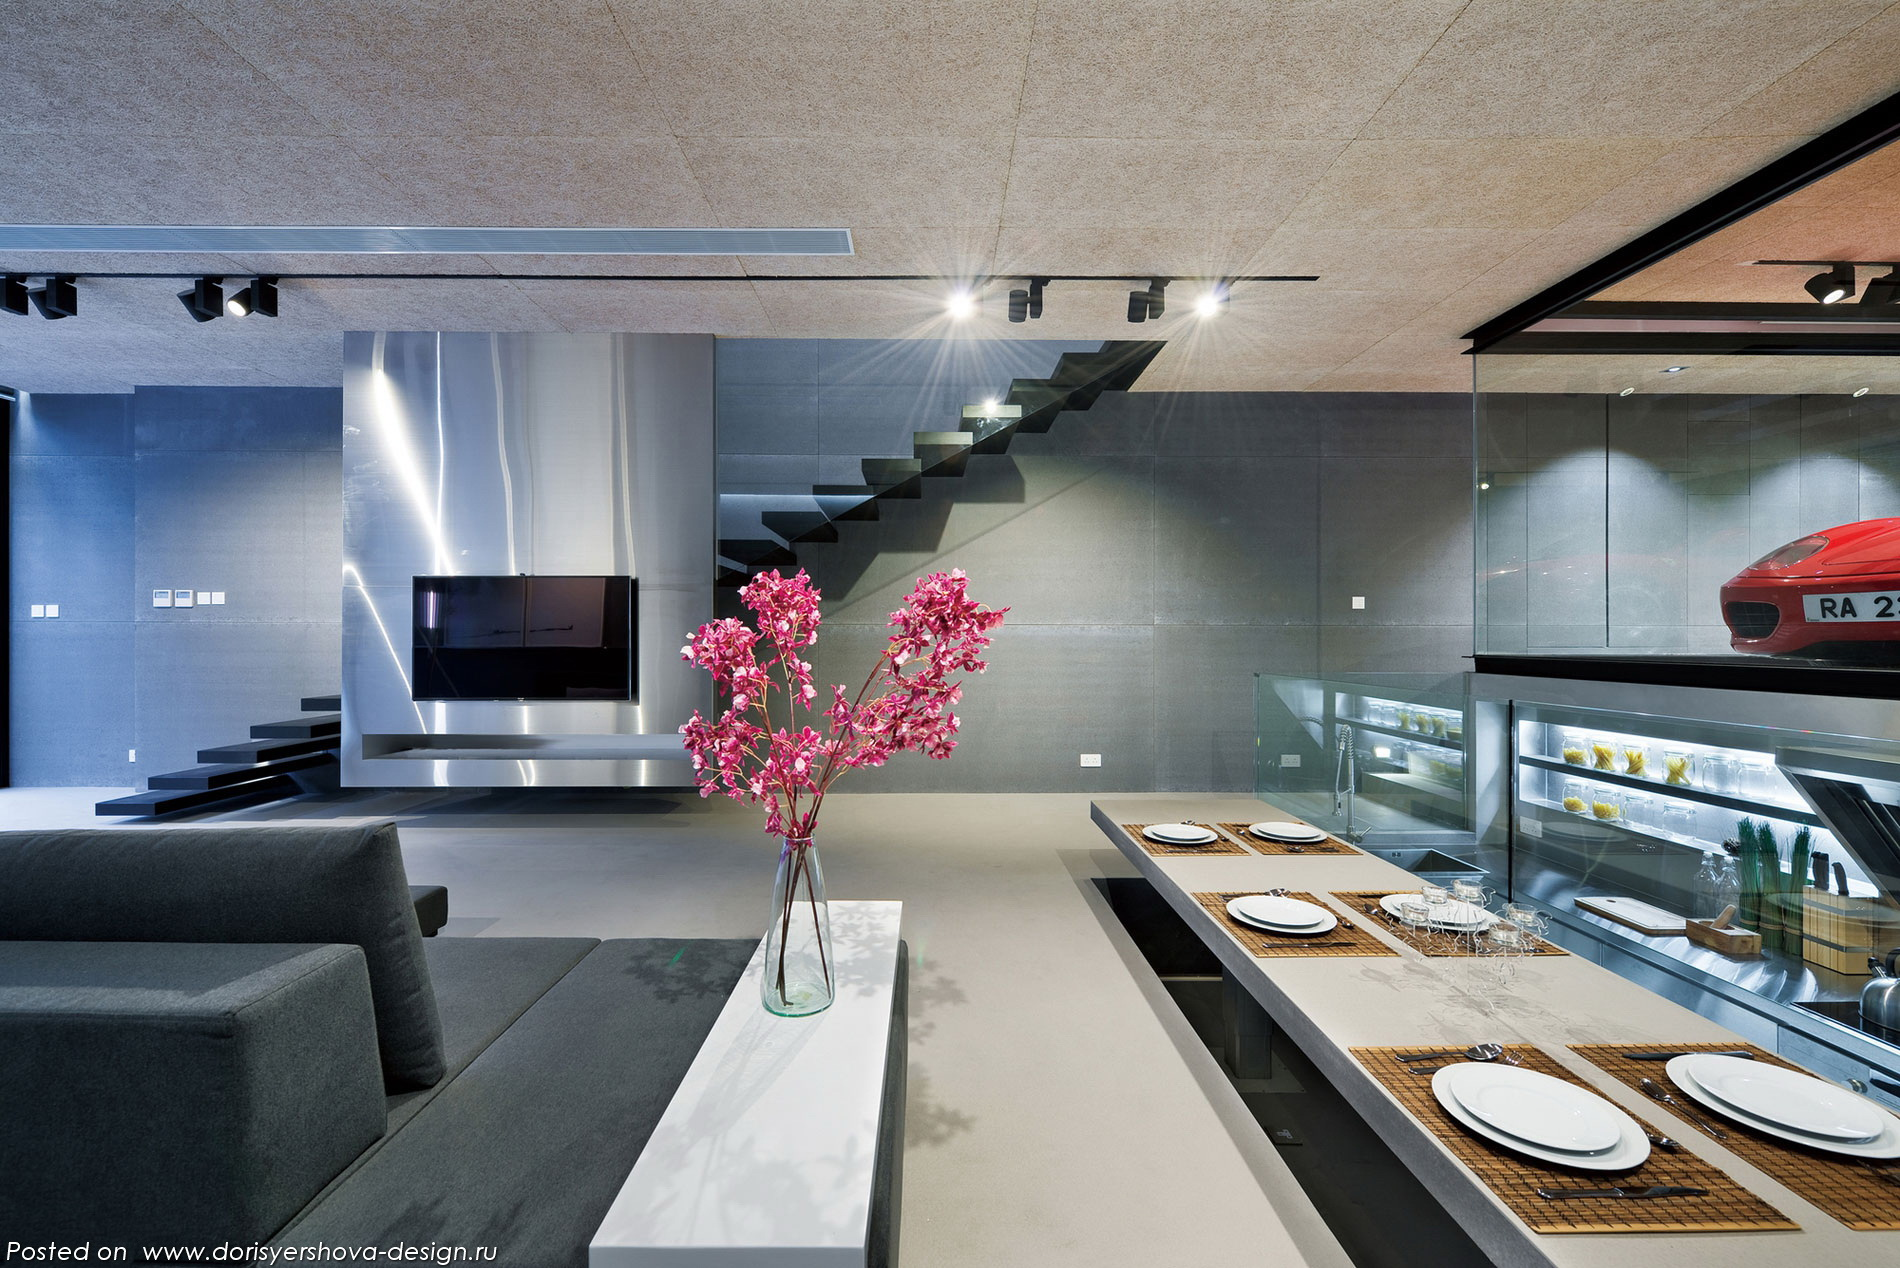 феррари в интерьере, интерьеры дома в стиле хай-тек